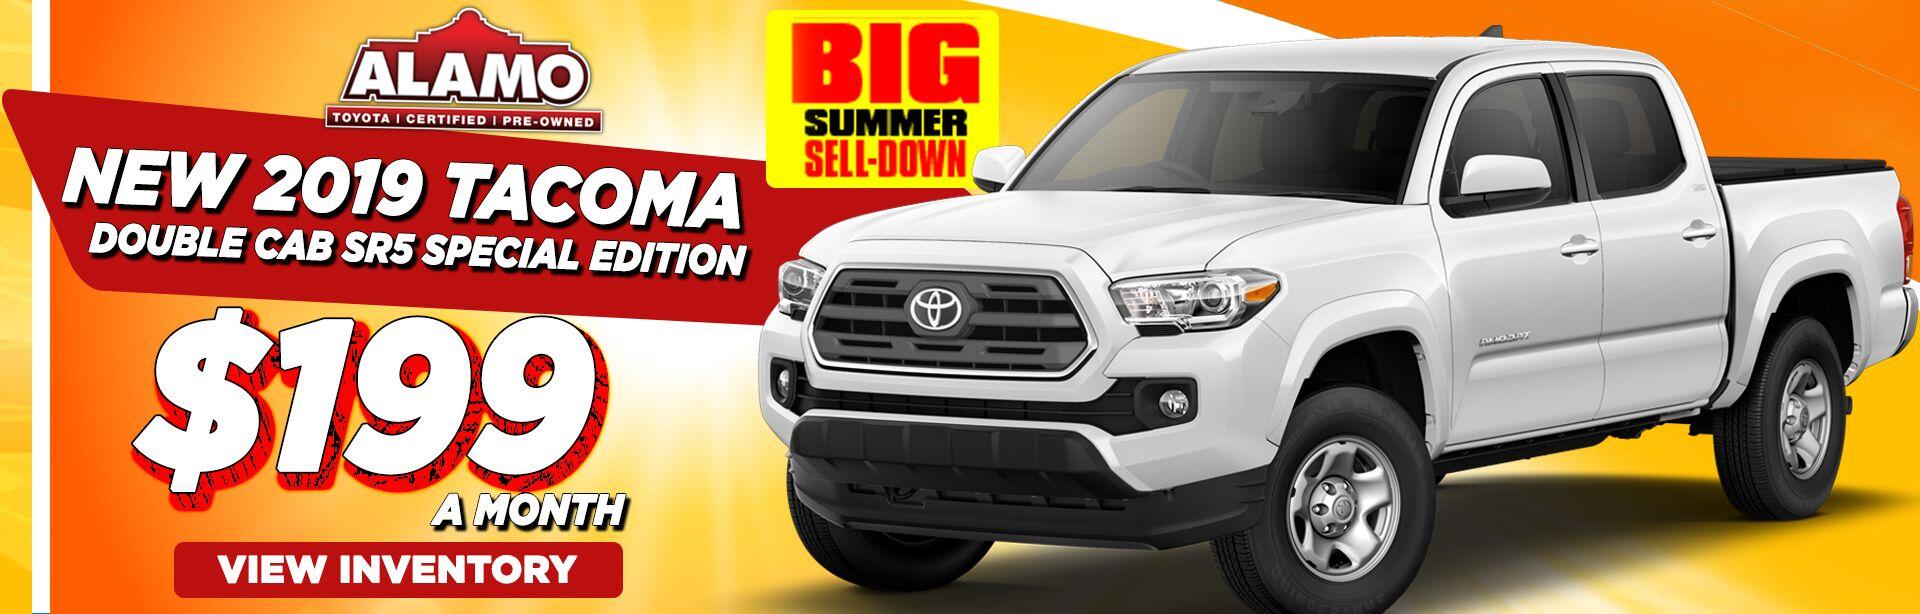 Toyota Dealership San Antonio Tx >> Toyota Dealership San Antonio Tx Used Cars Alamo Toyota